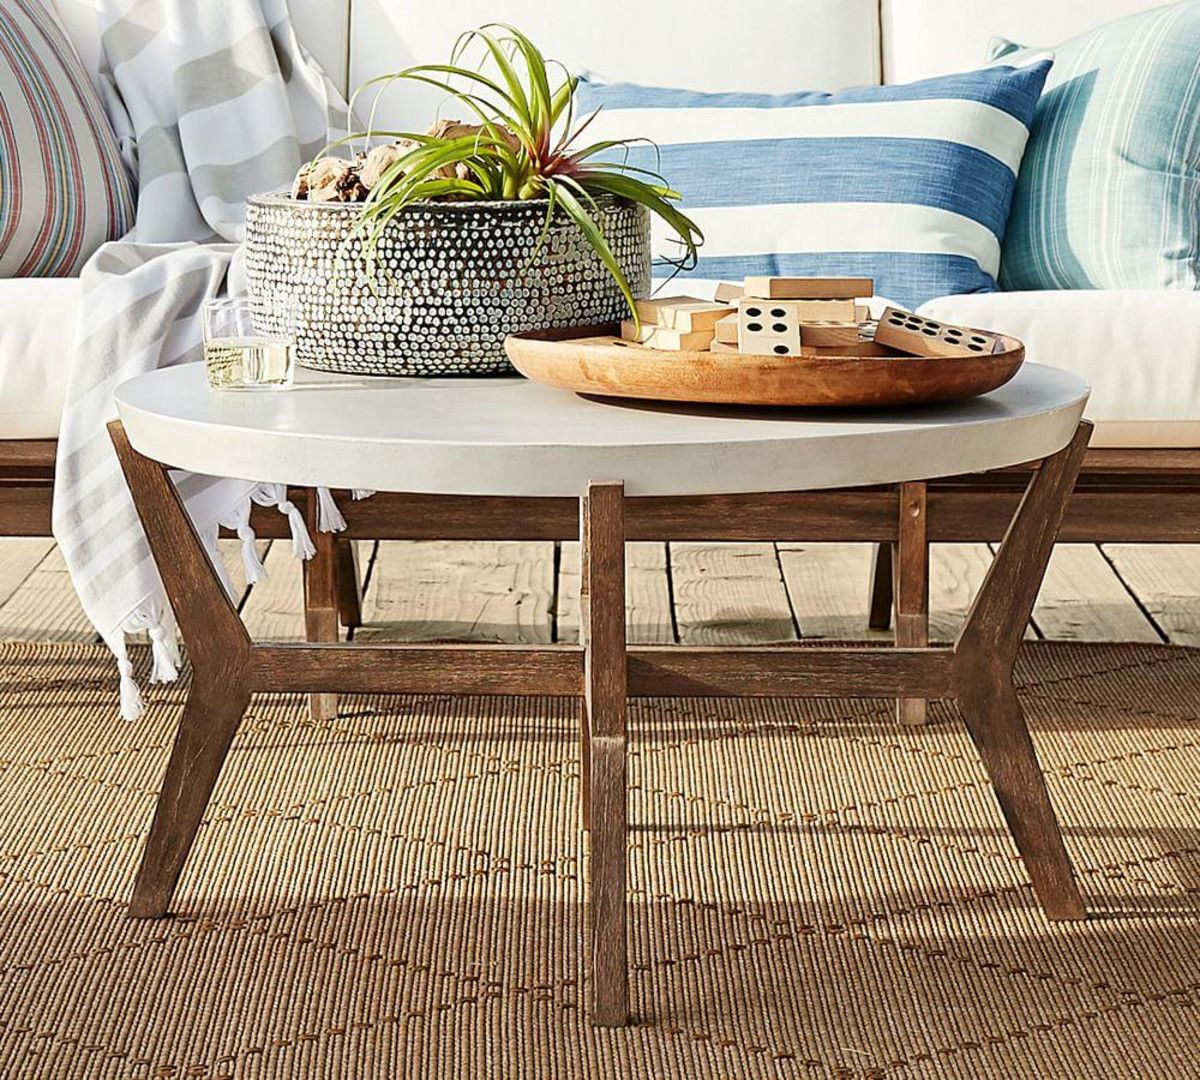 Raylan Outdoor Coffee Table Coffee table, Outdoor coffee